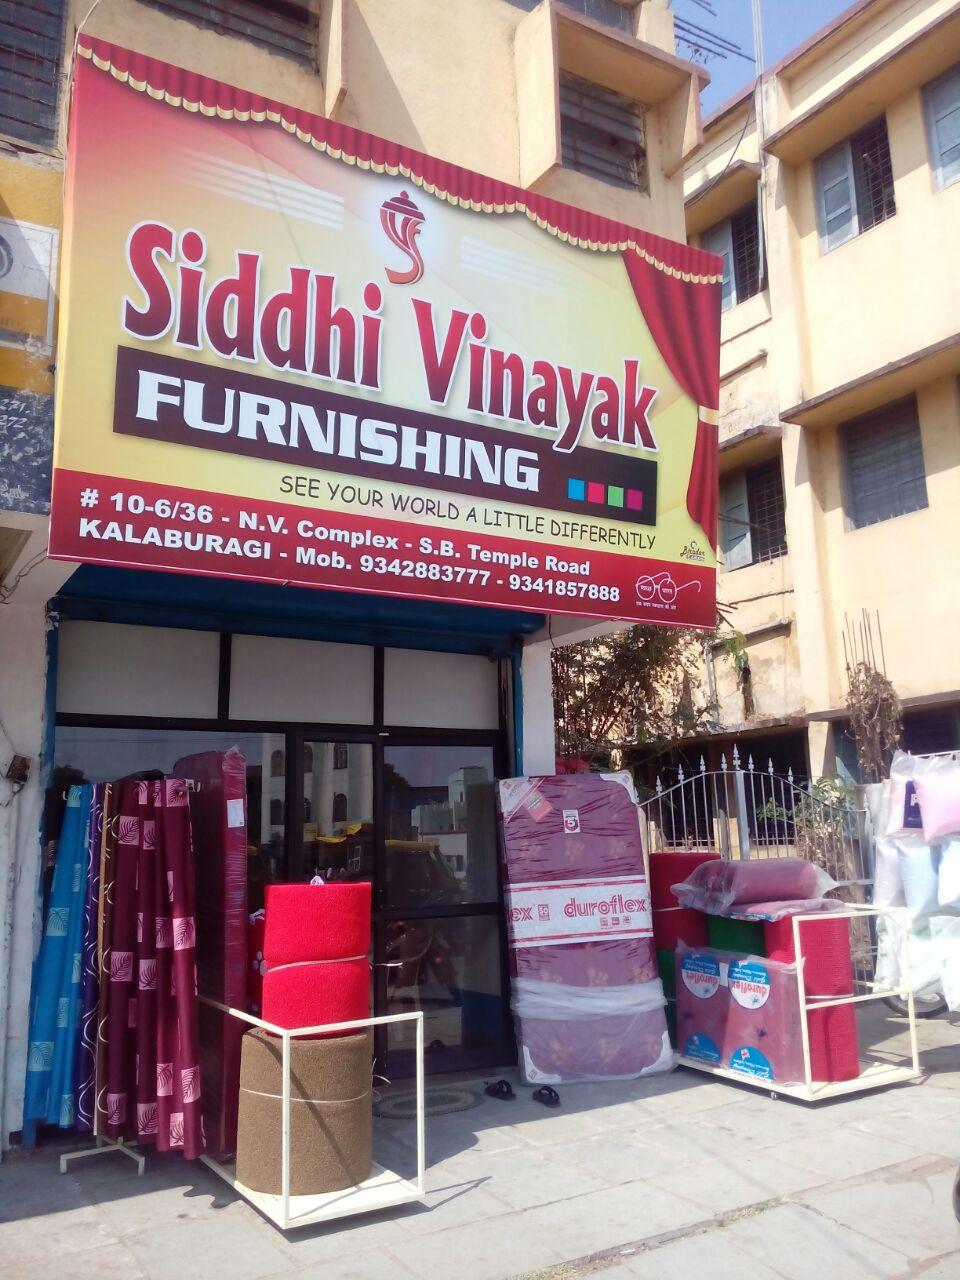 SIDDHI VINAYAK FURNISHING